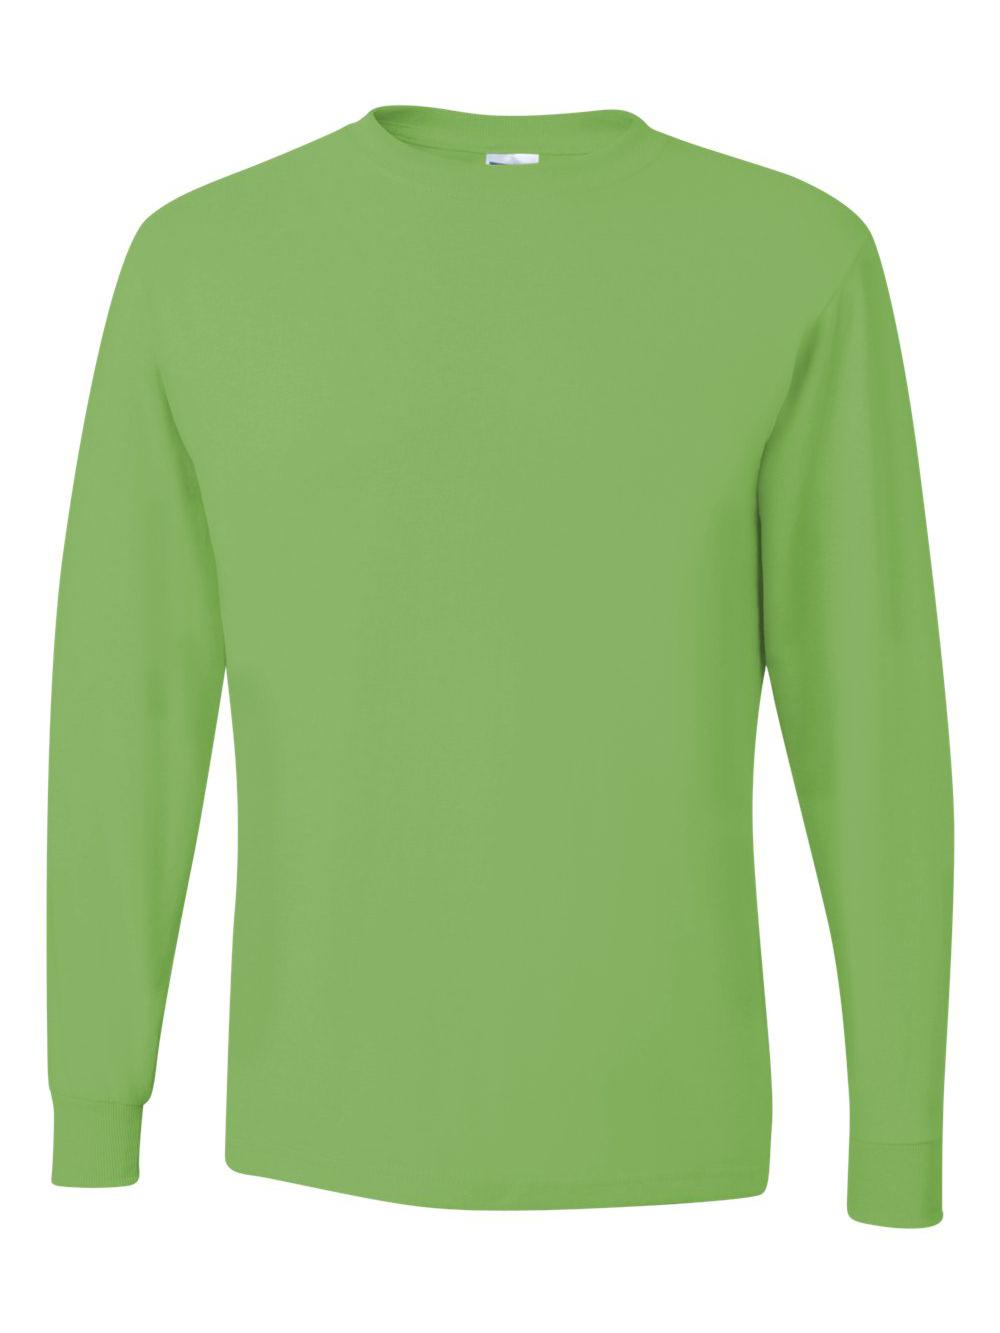 Jerzees-Dri-Power-Long-Sleeve-50-50-T-Shirt-29LSR thumbnail 51